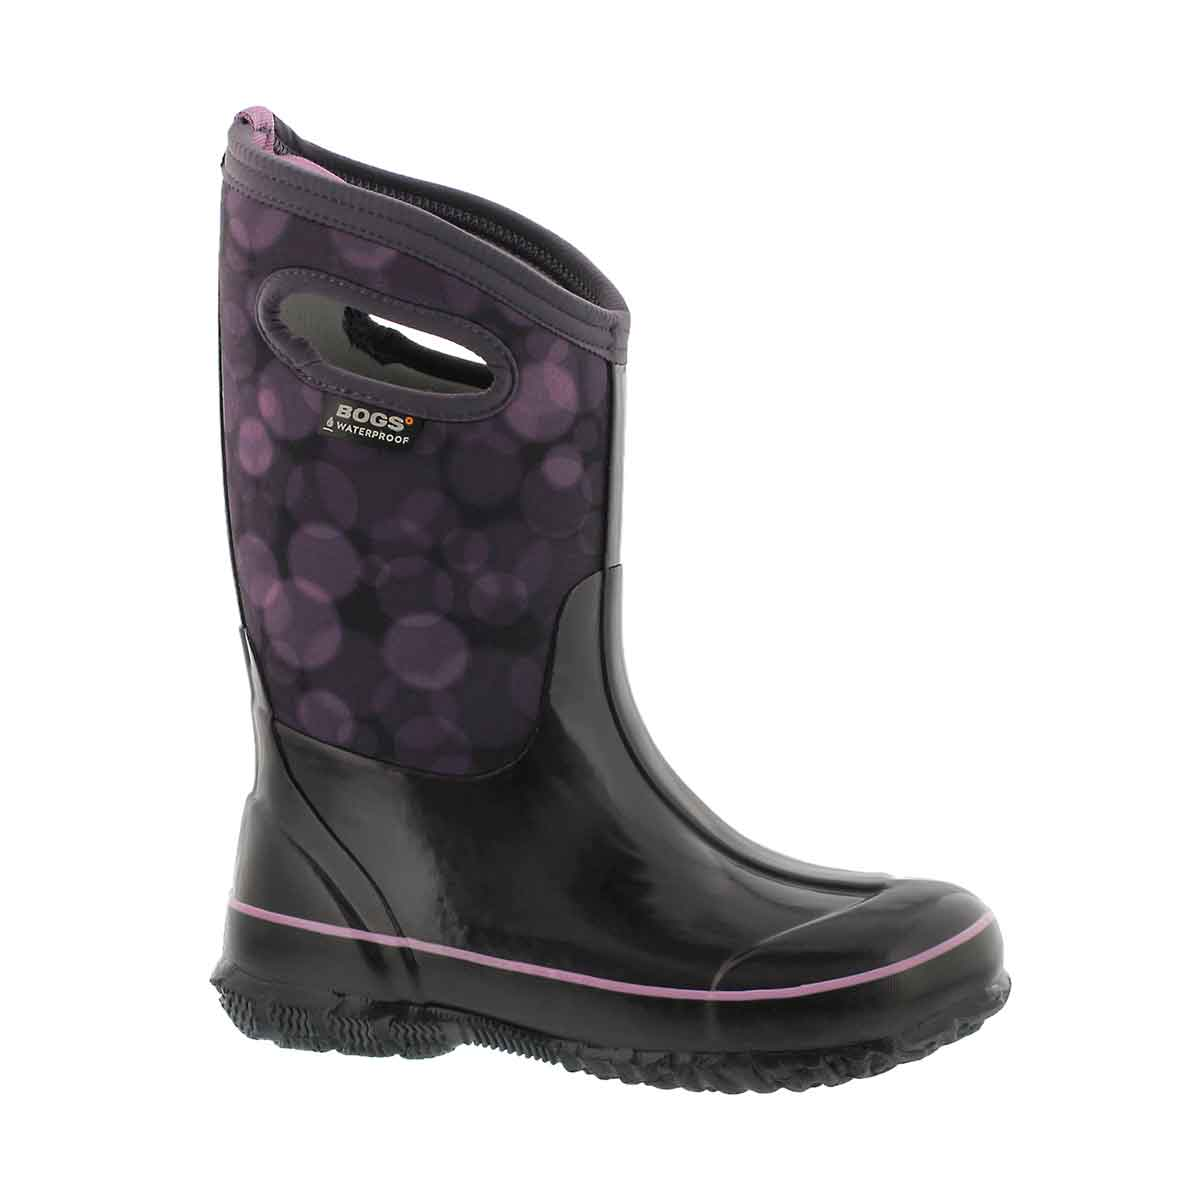 Girls' CLASSIC RN purple multi waterproof boots